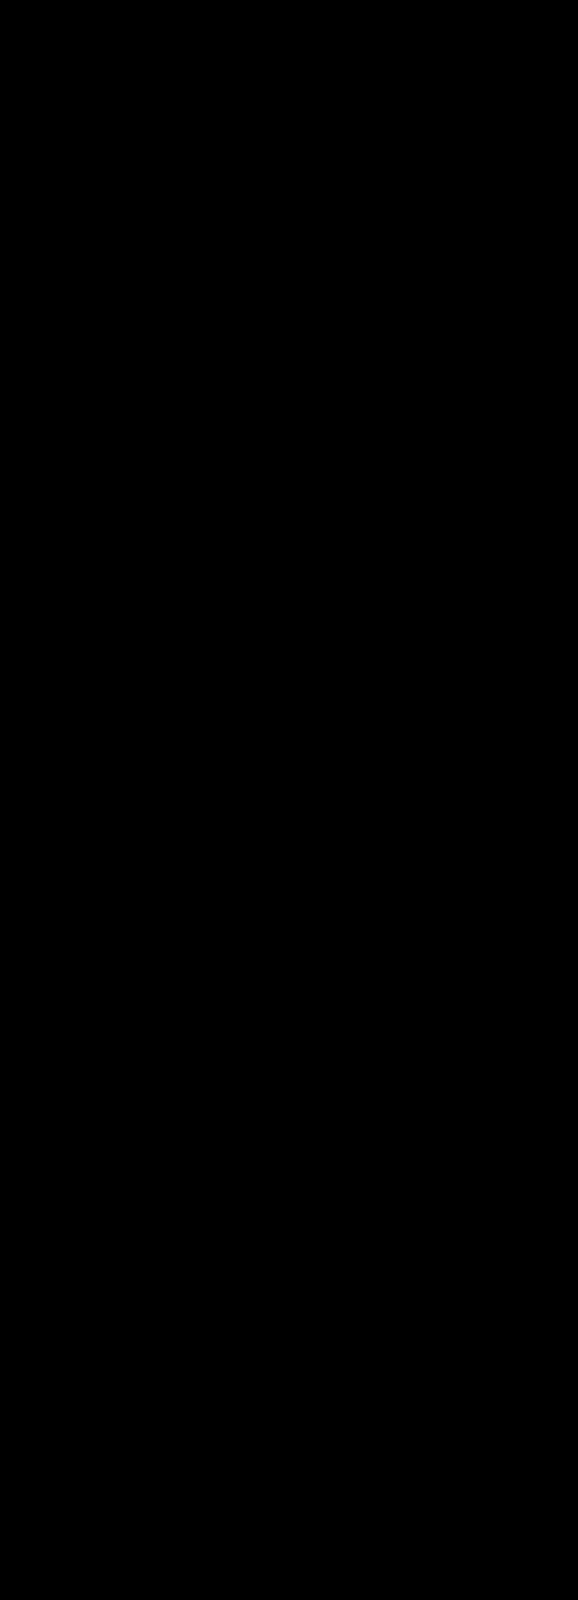 ganpati line art